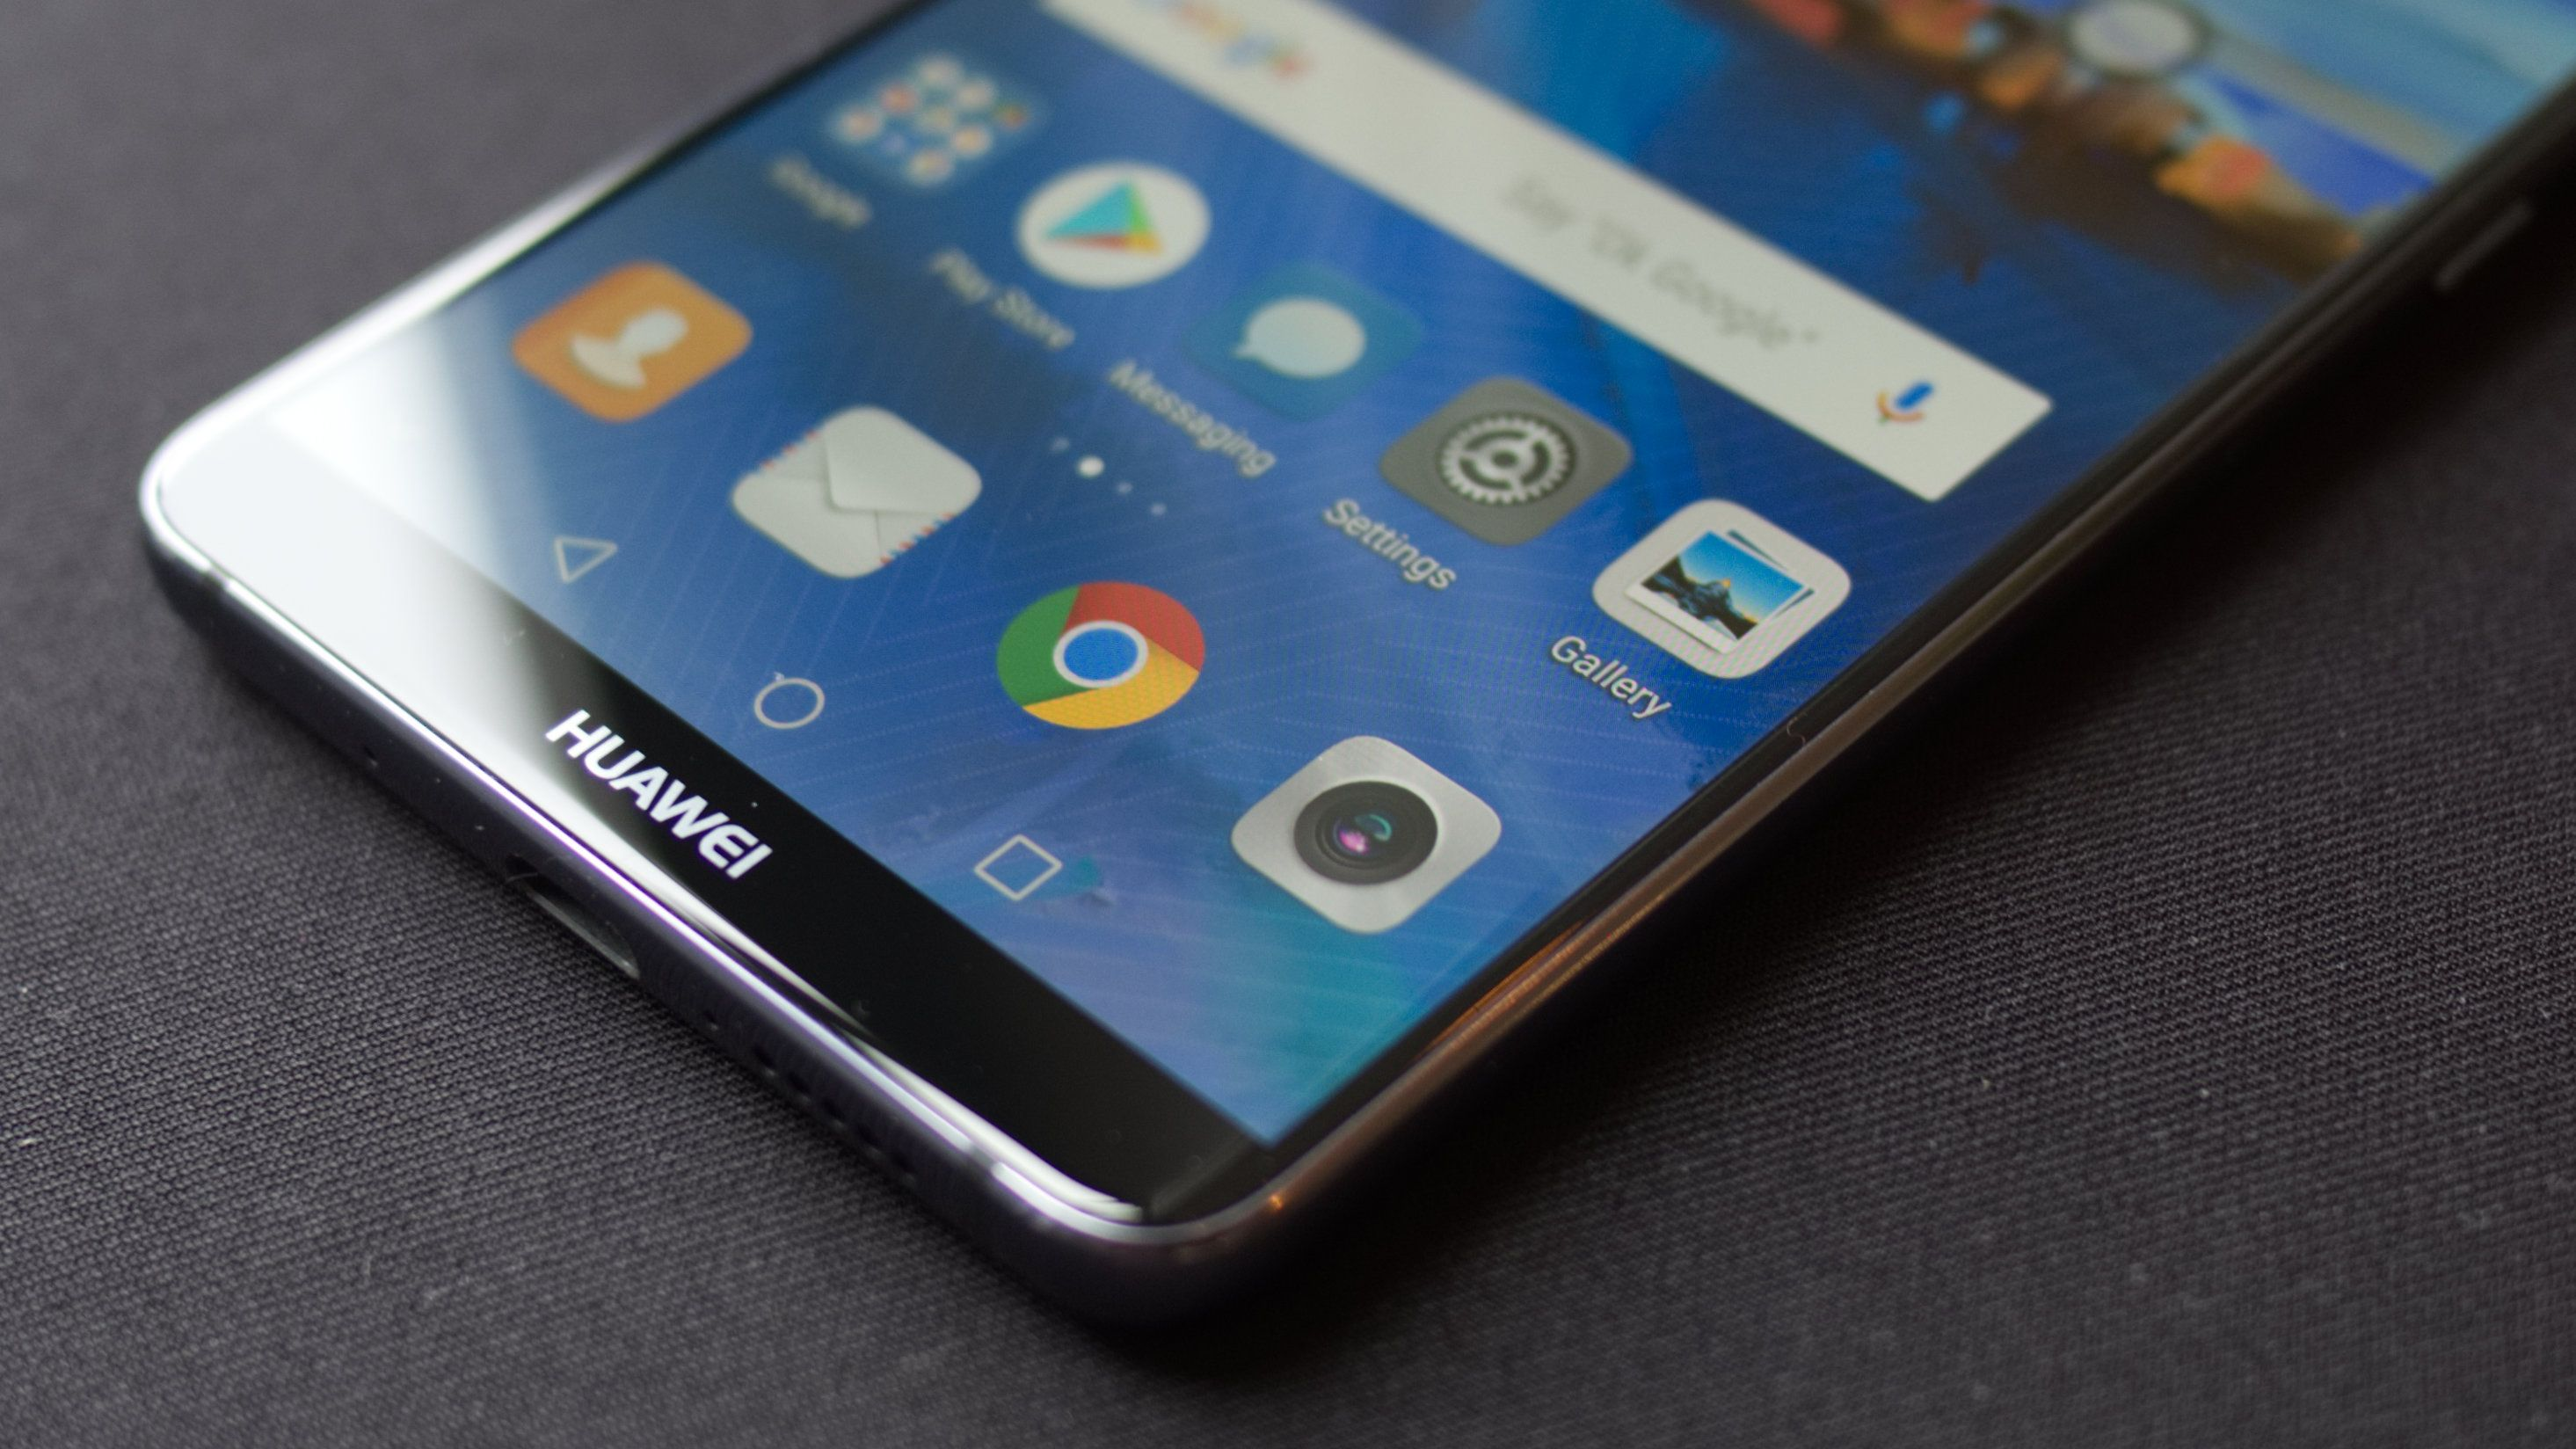 Huawei Mate 10 Pro Review Smartphone Phone Huawei Mate